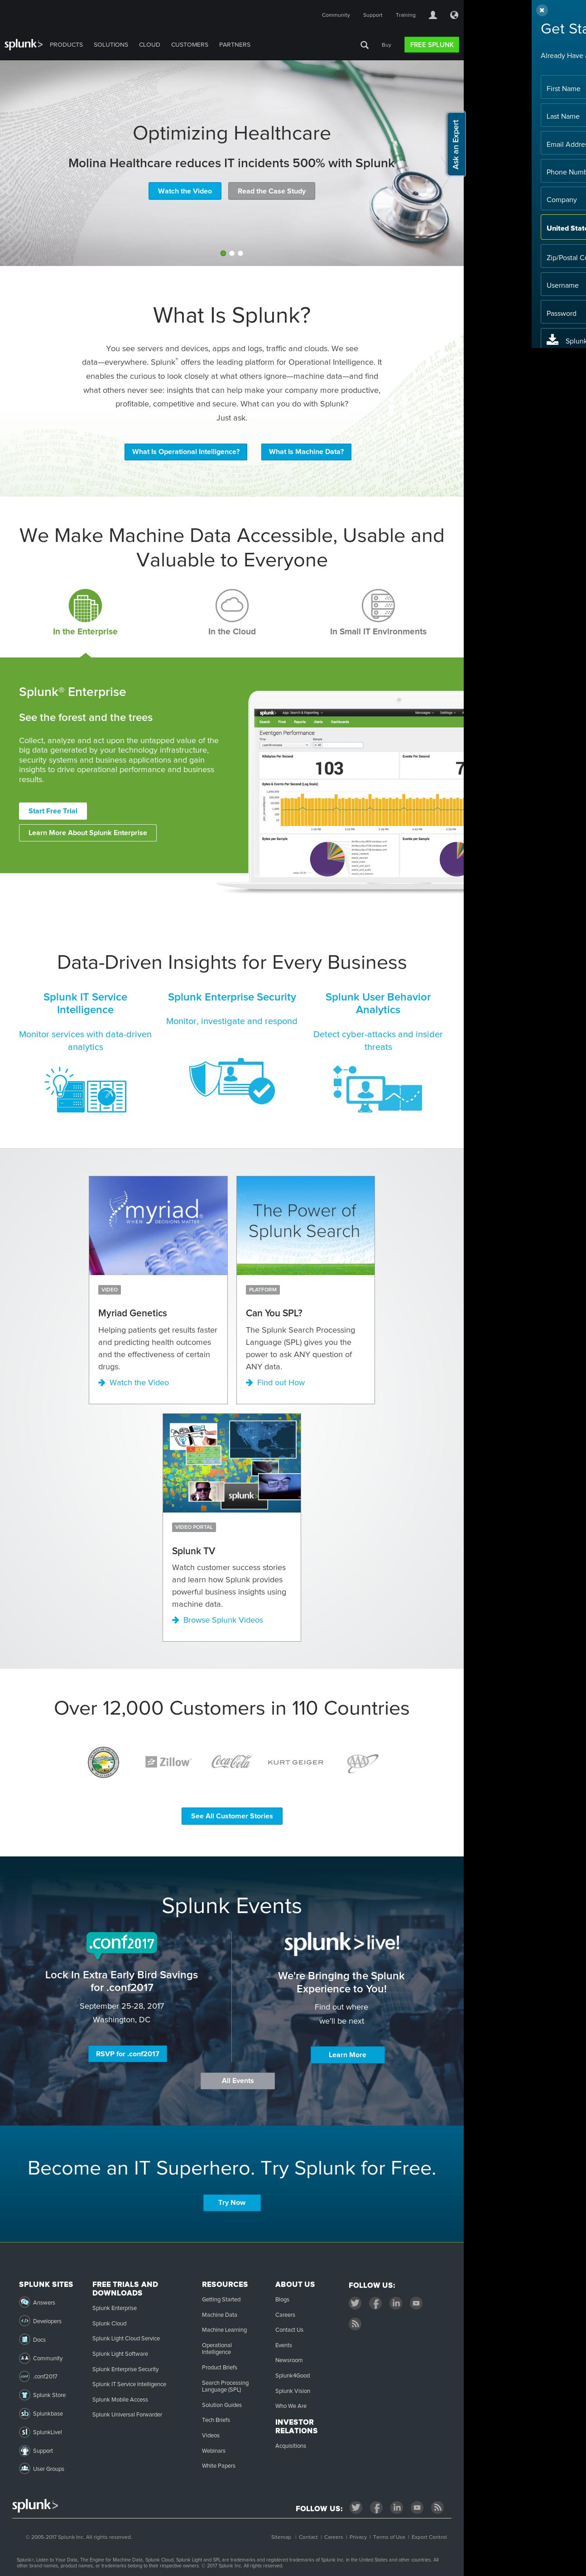 Splunk Competitors, Revenue and Employees - Owler Company Profile